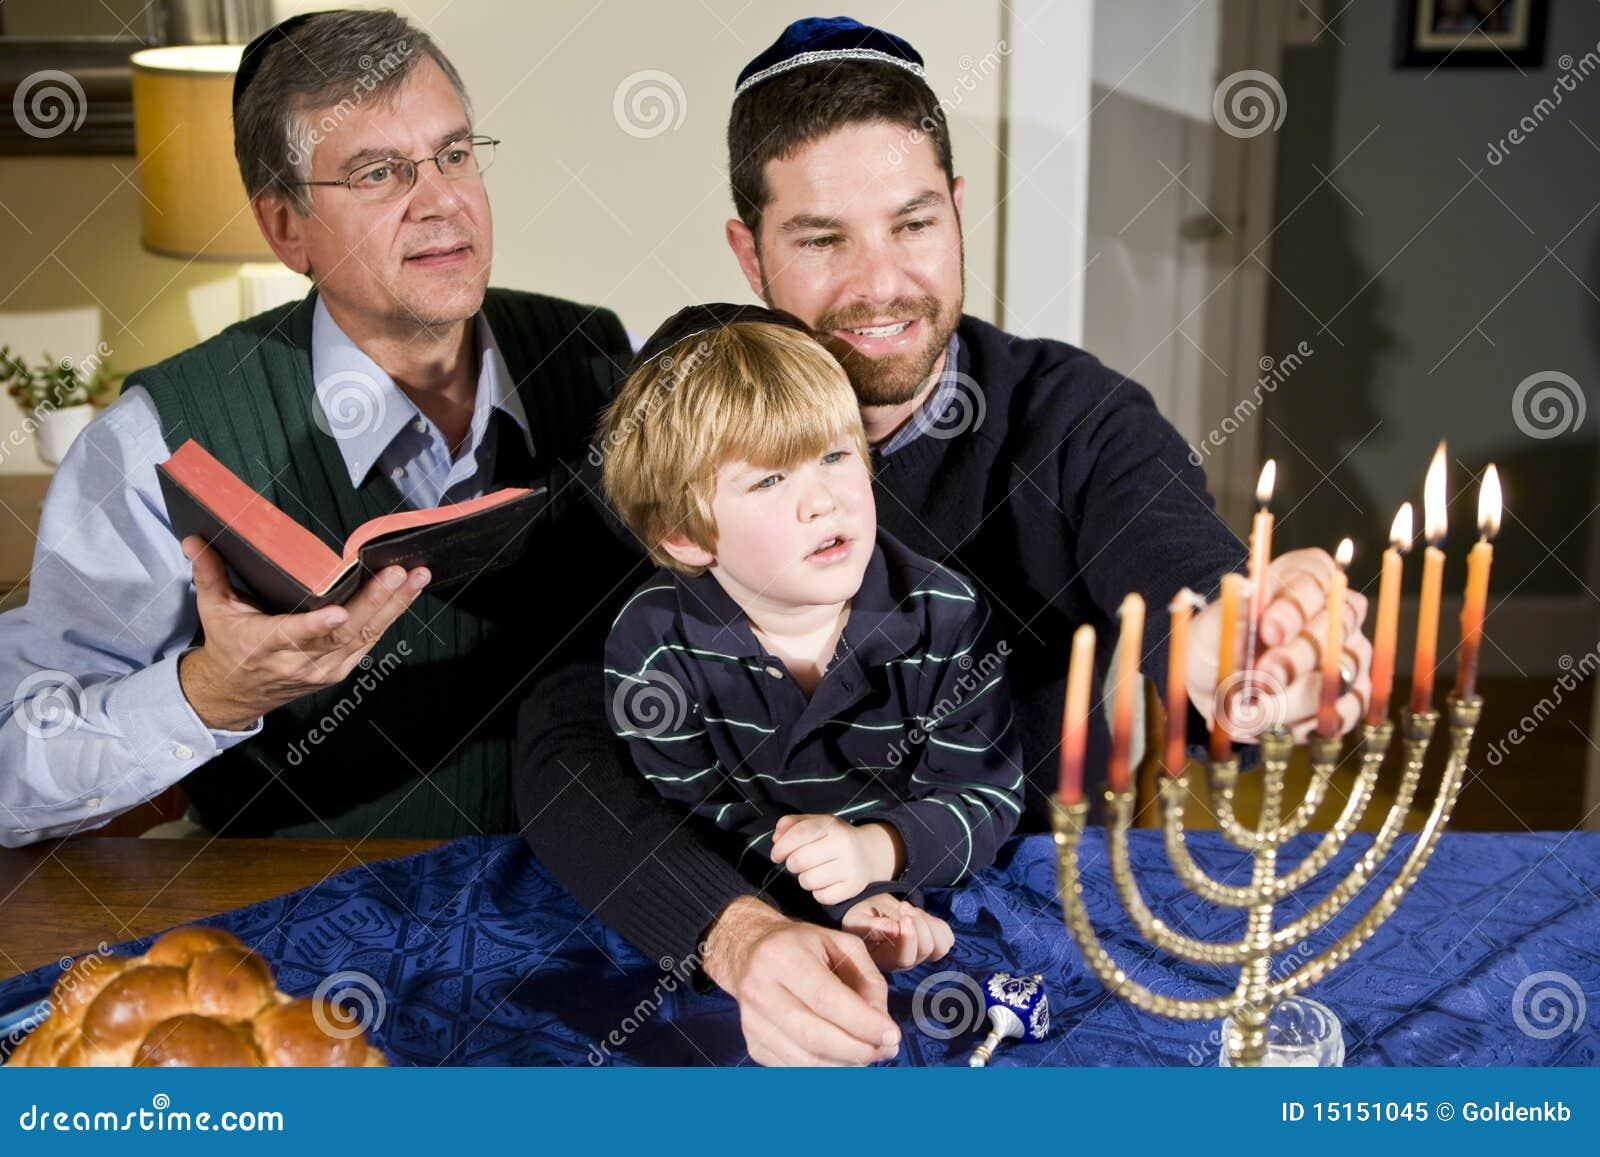 Jewish family lighting Hanukkah menorah